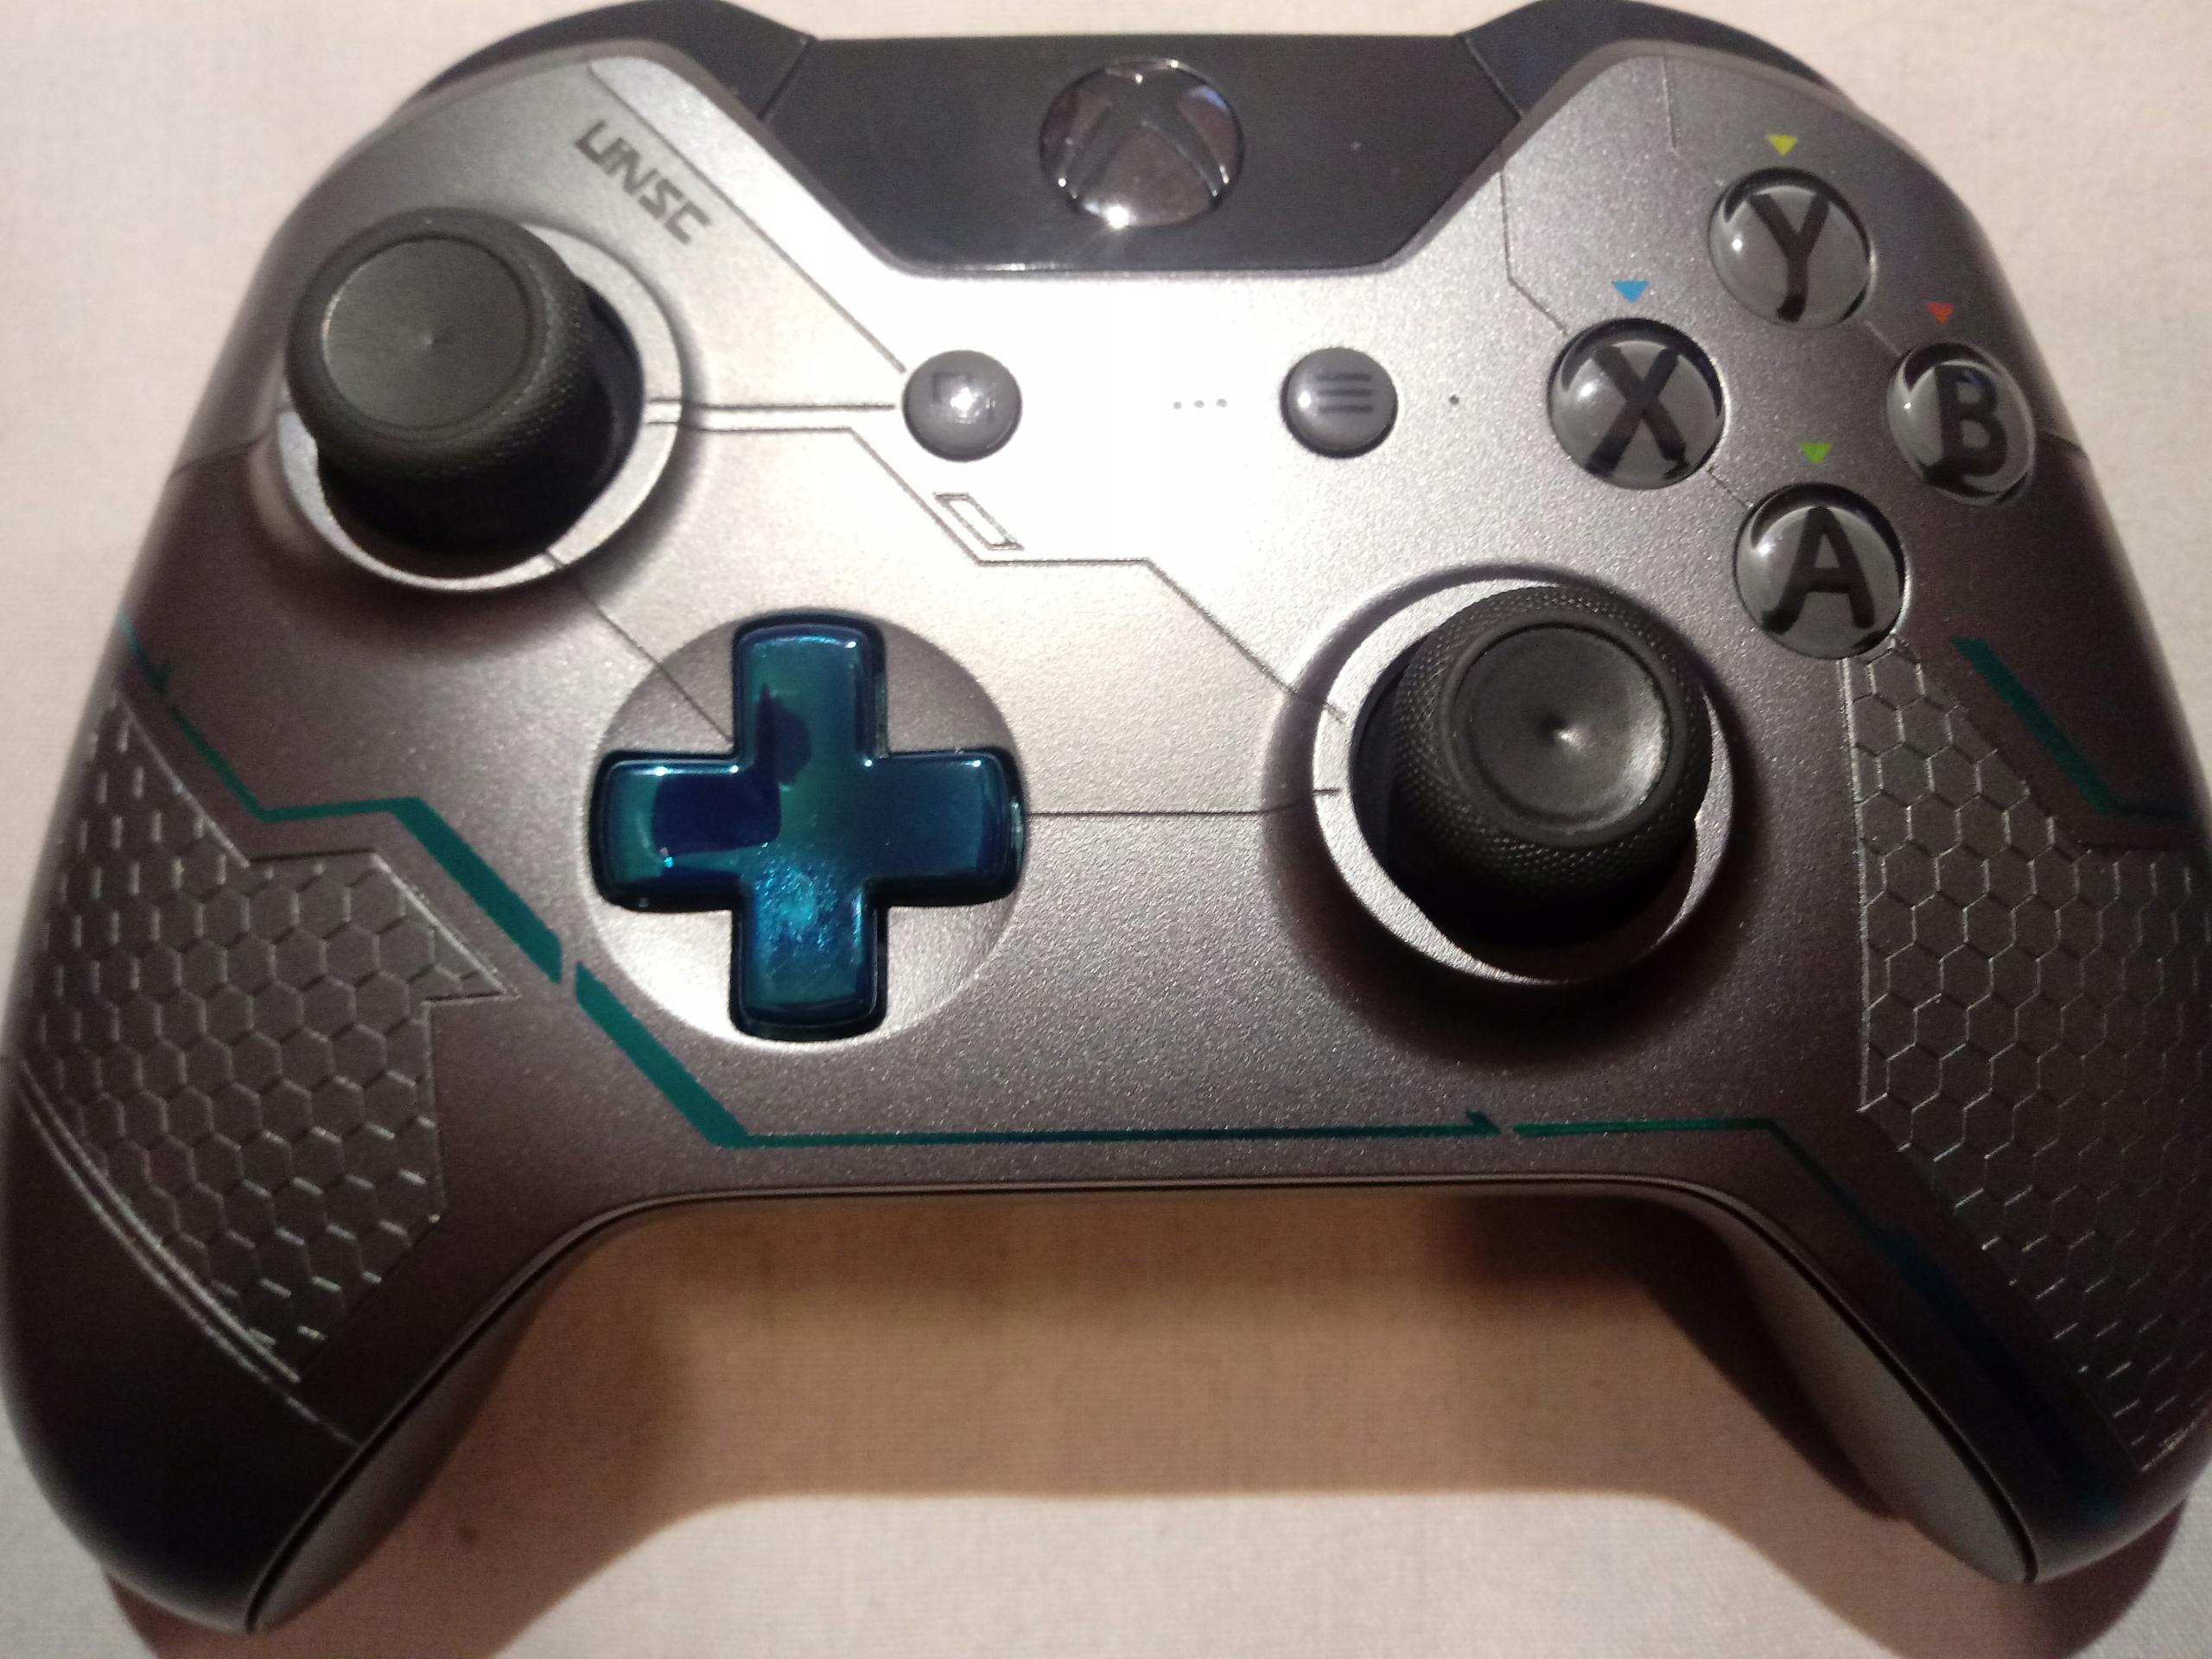 pad XBOX One S Halo 5 Guardians model 1697 BDB - 7733732950